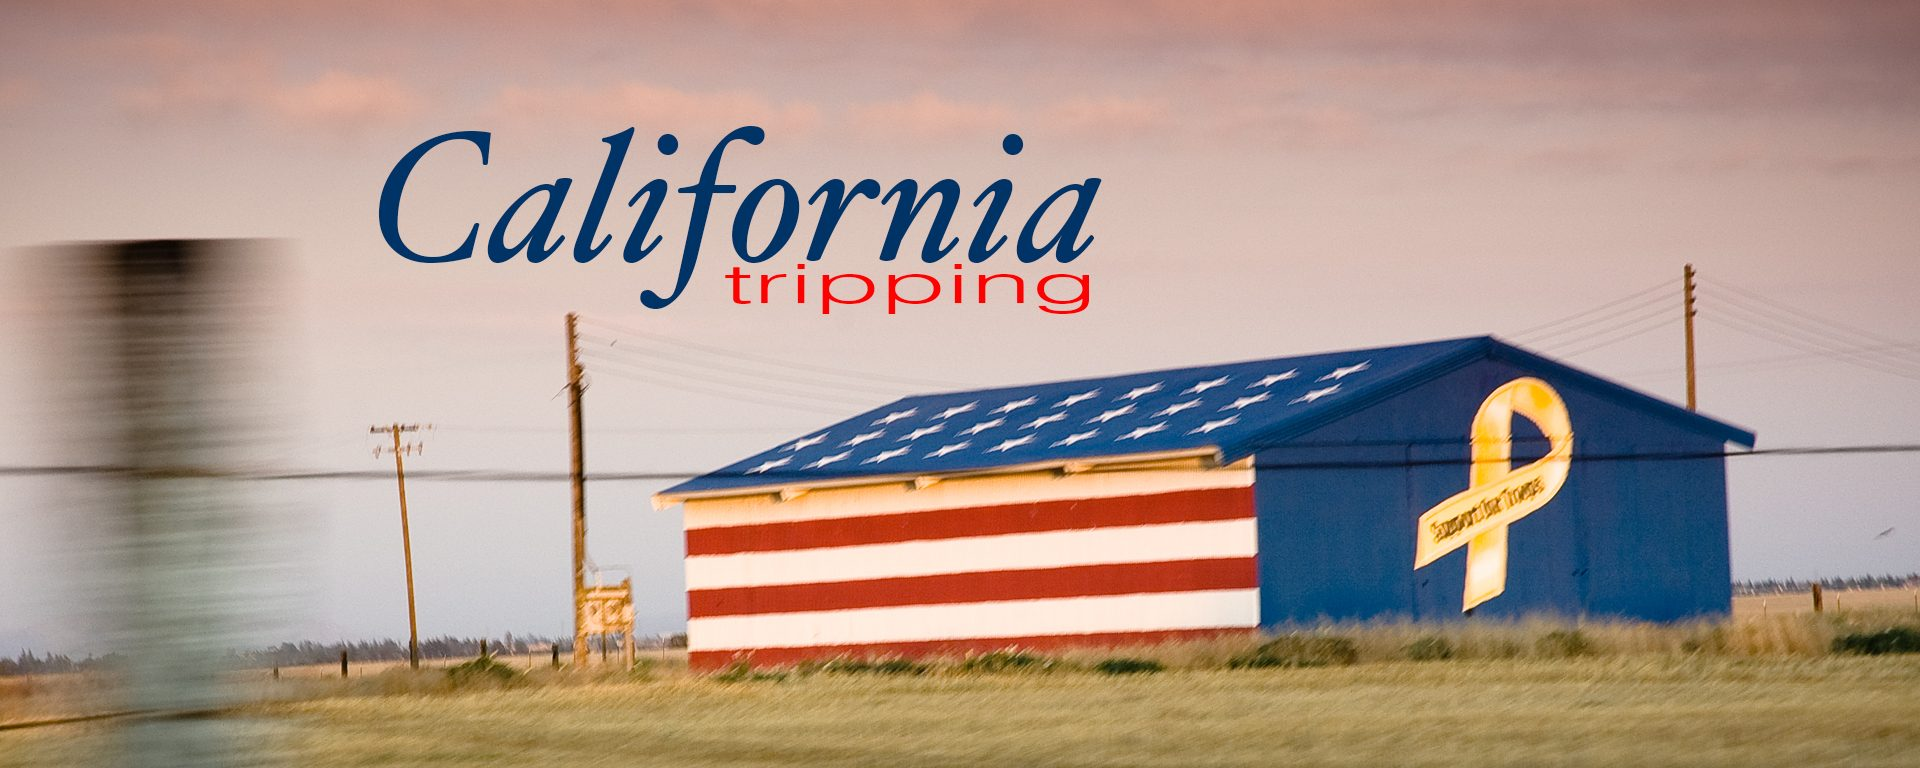 California tripping